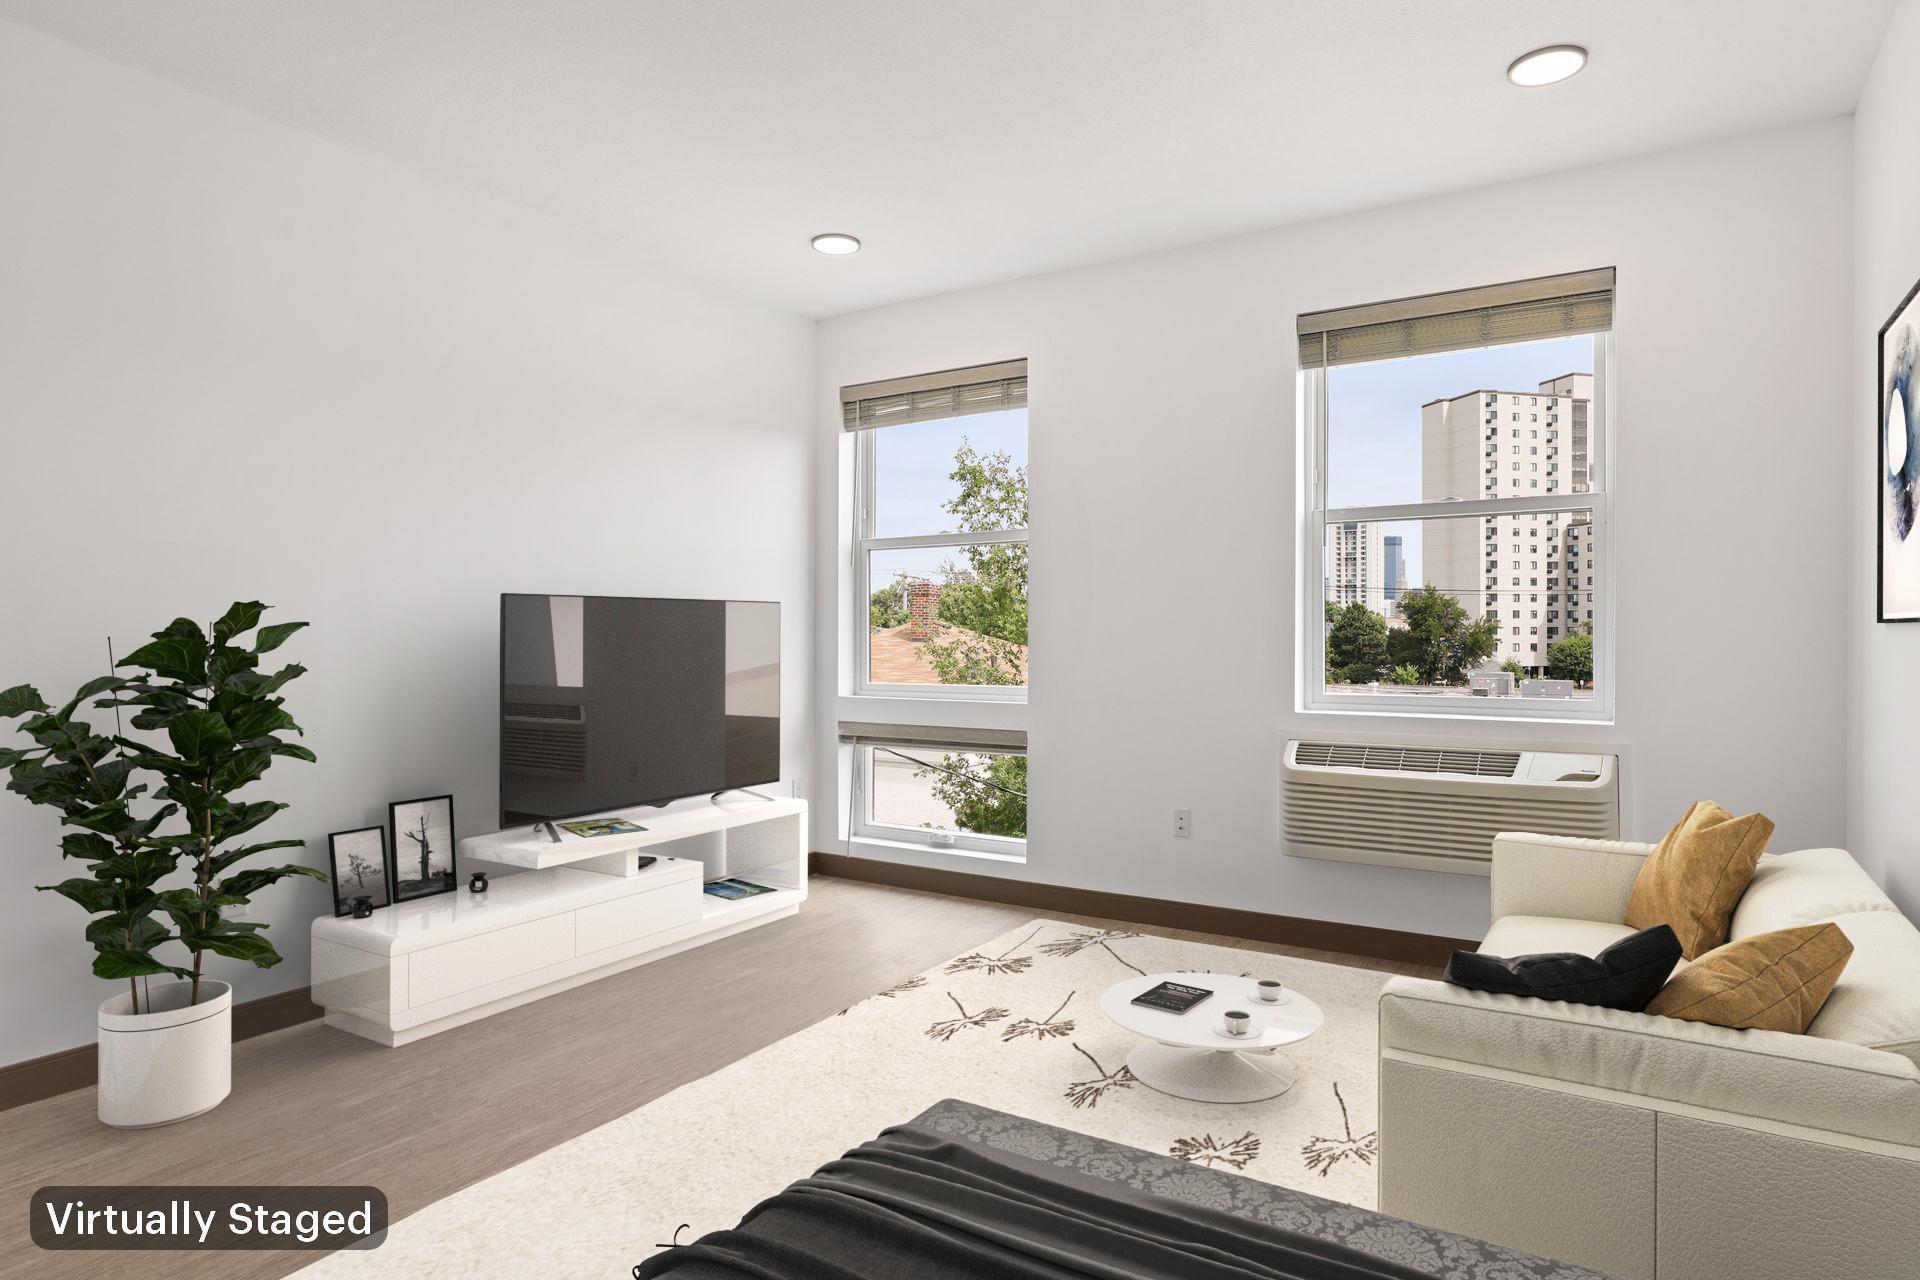 2810 Park Avenue, Minneapolis, Minnesota 55415, ,1 BathroomBathrooms,Residential Lease,For Sale,Park,NST6109751